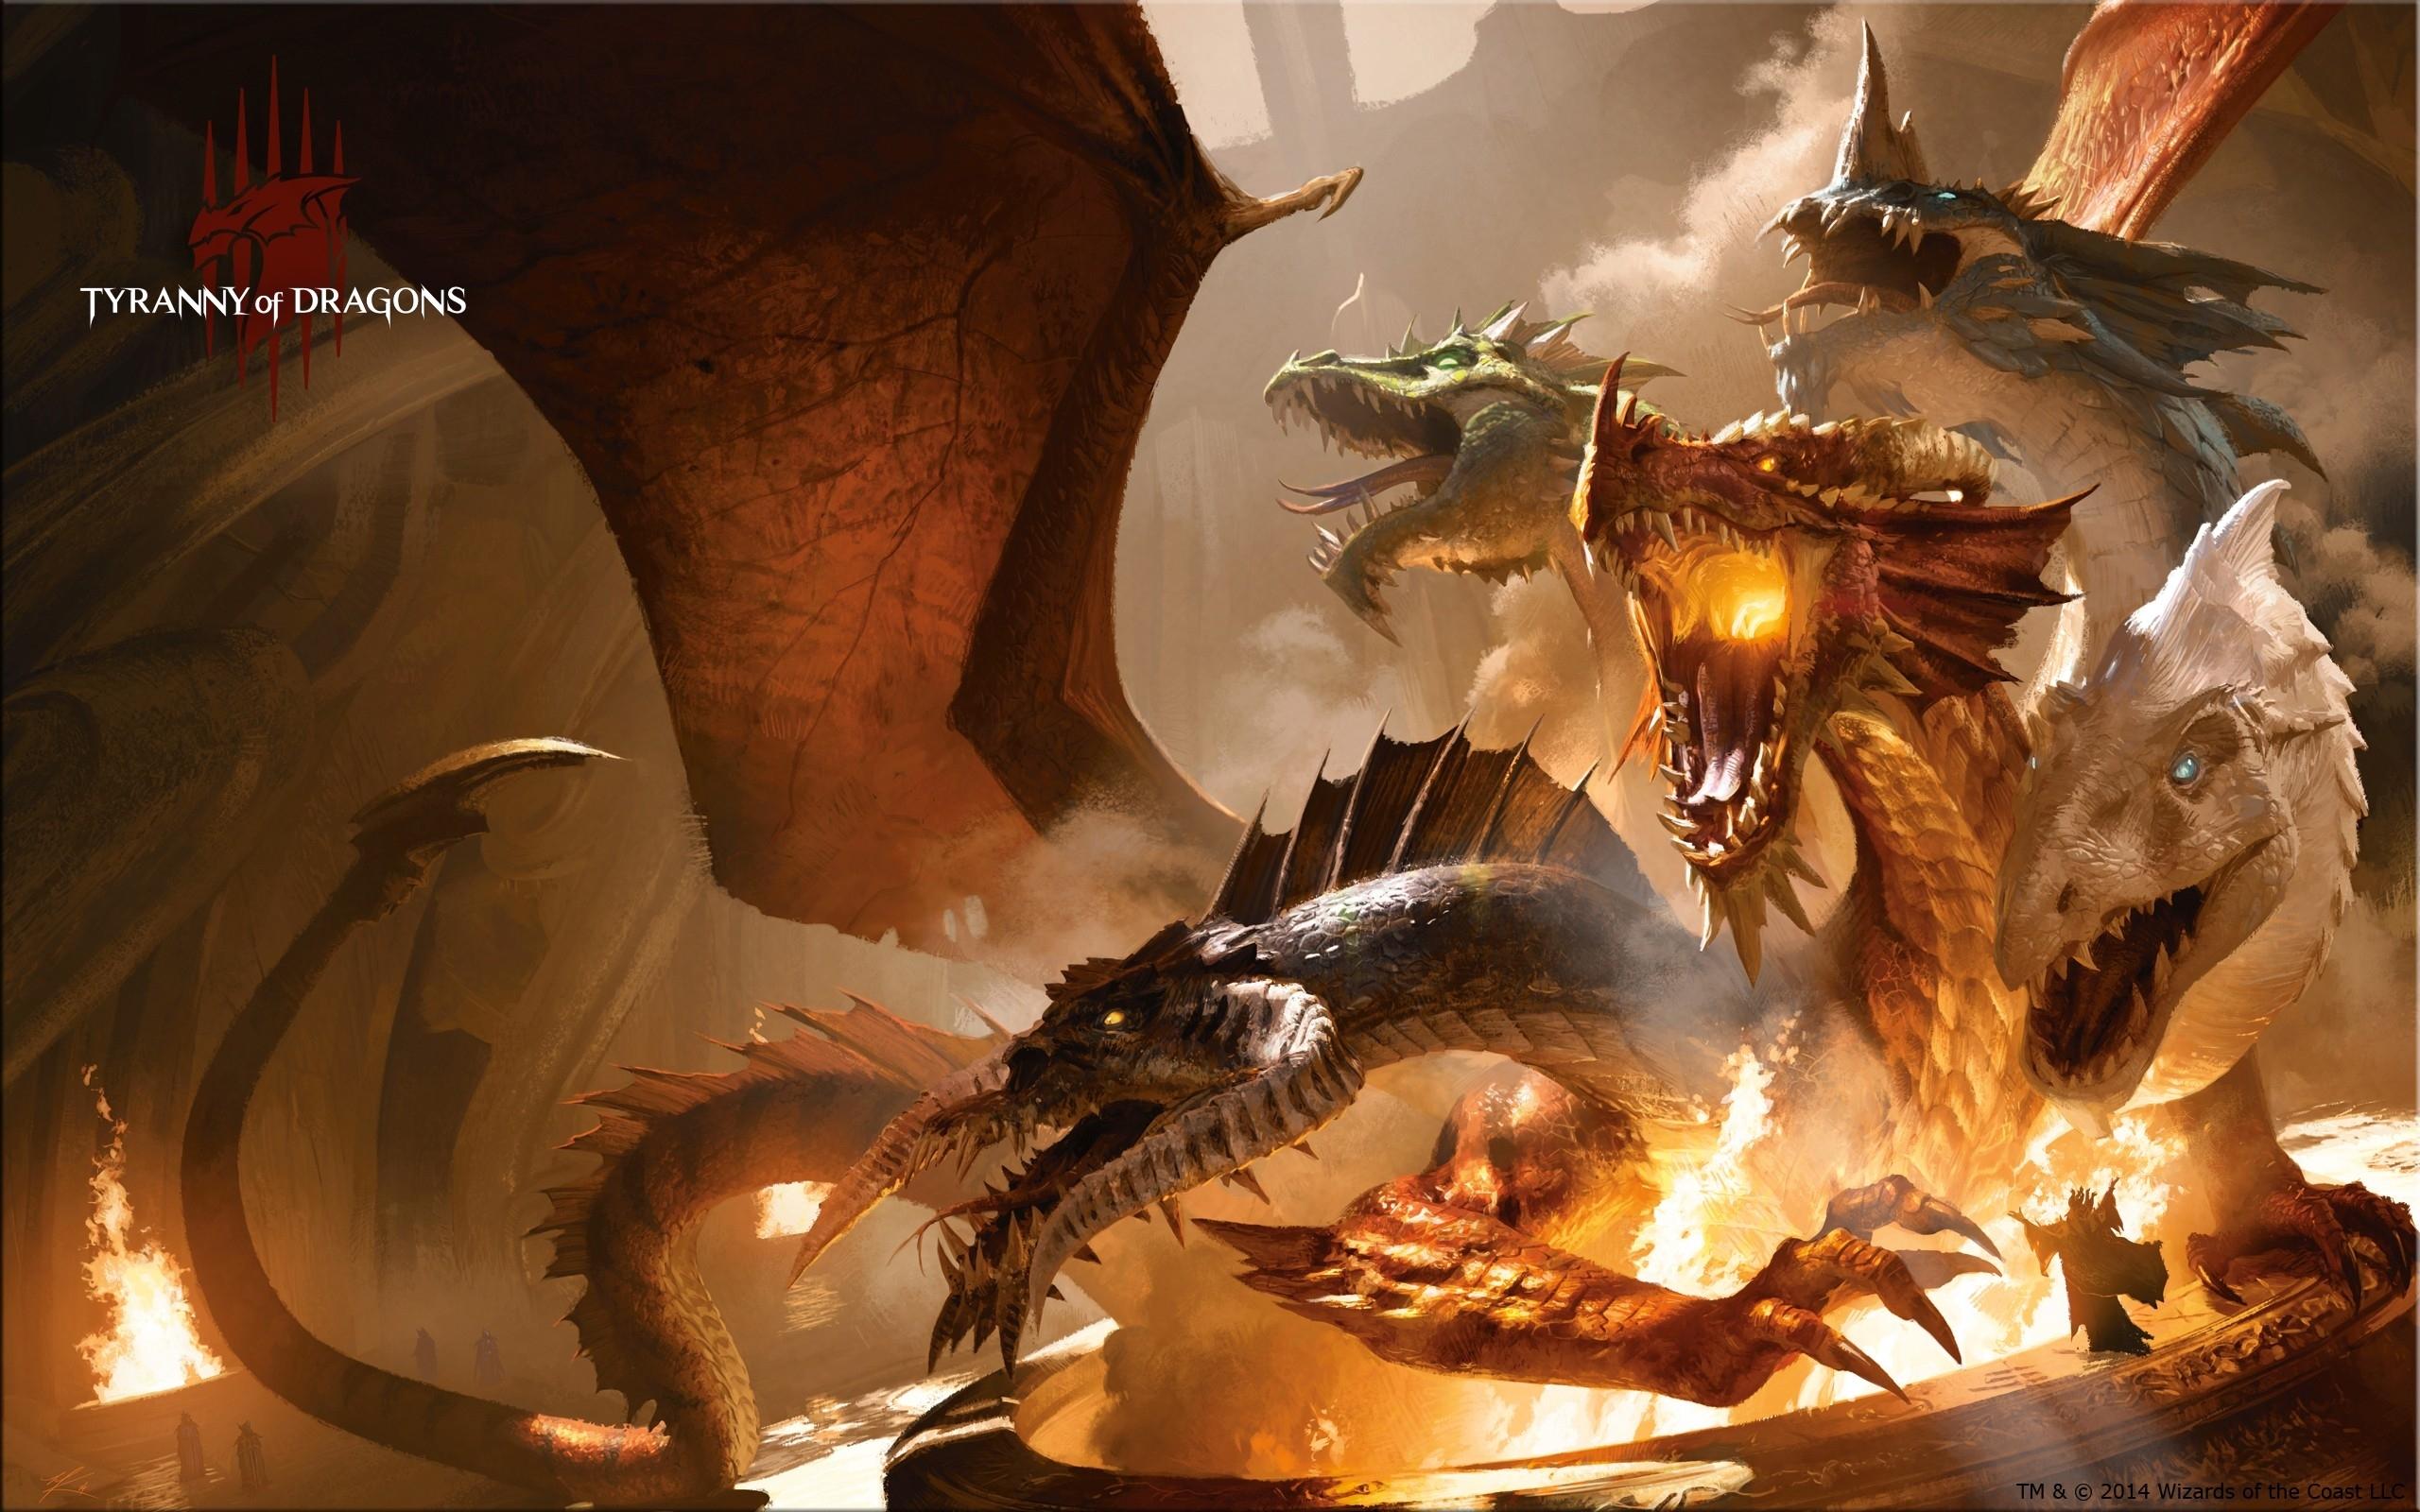 wallpaper : fantasy art, artwork, dragon, mythology, dungeons